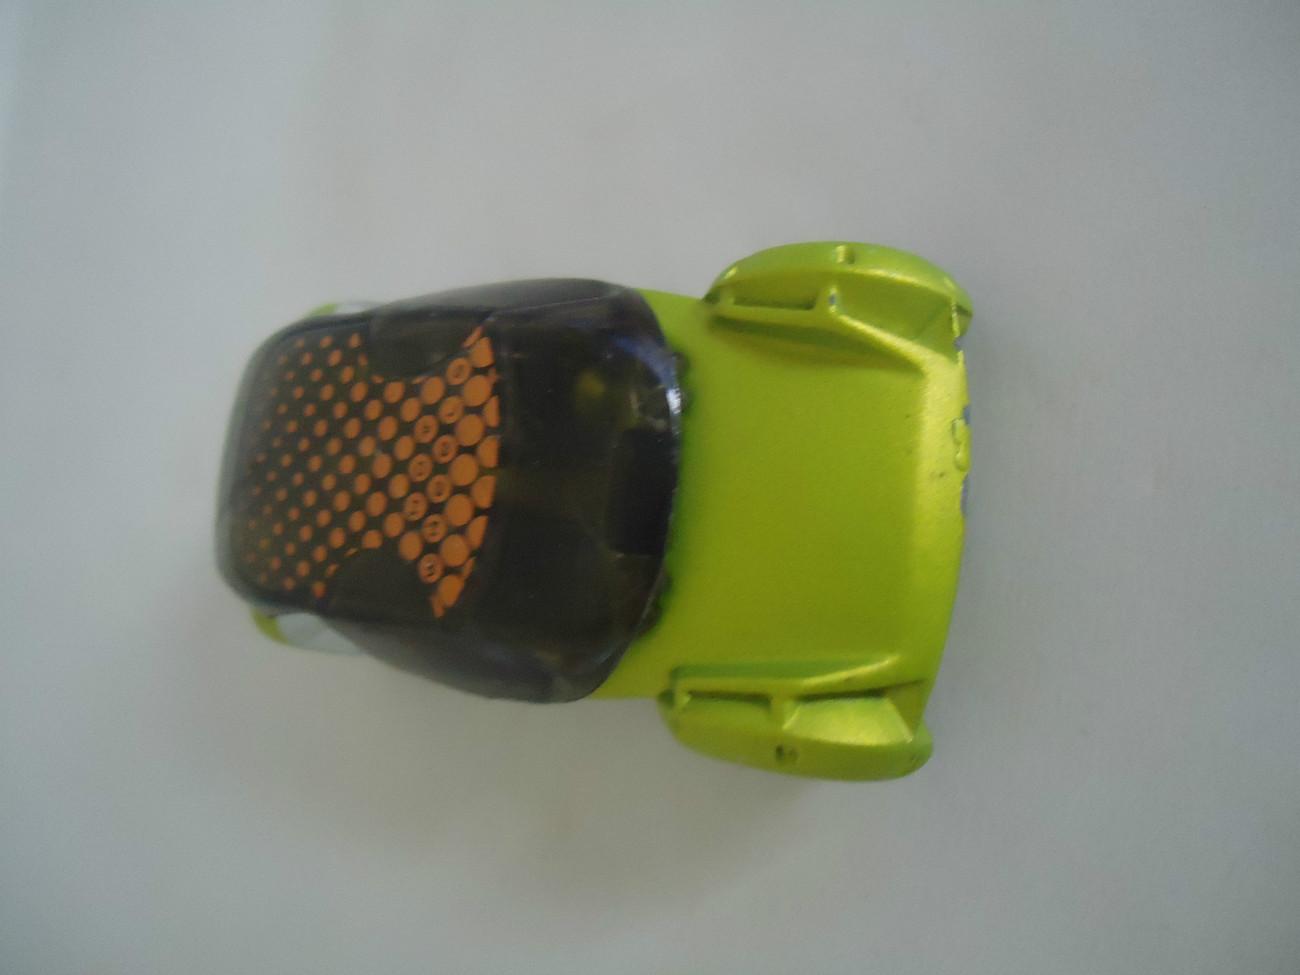 HOT WHEELS CAR MATTEL 2003 MALAYSIA HI IQ Diecast